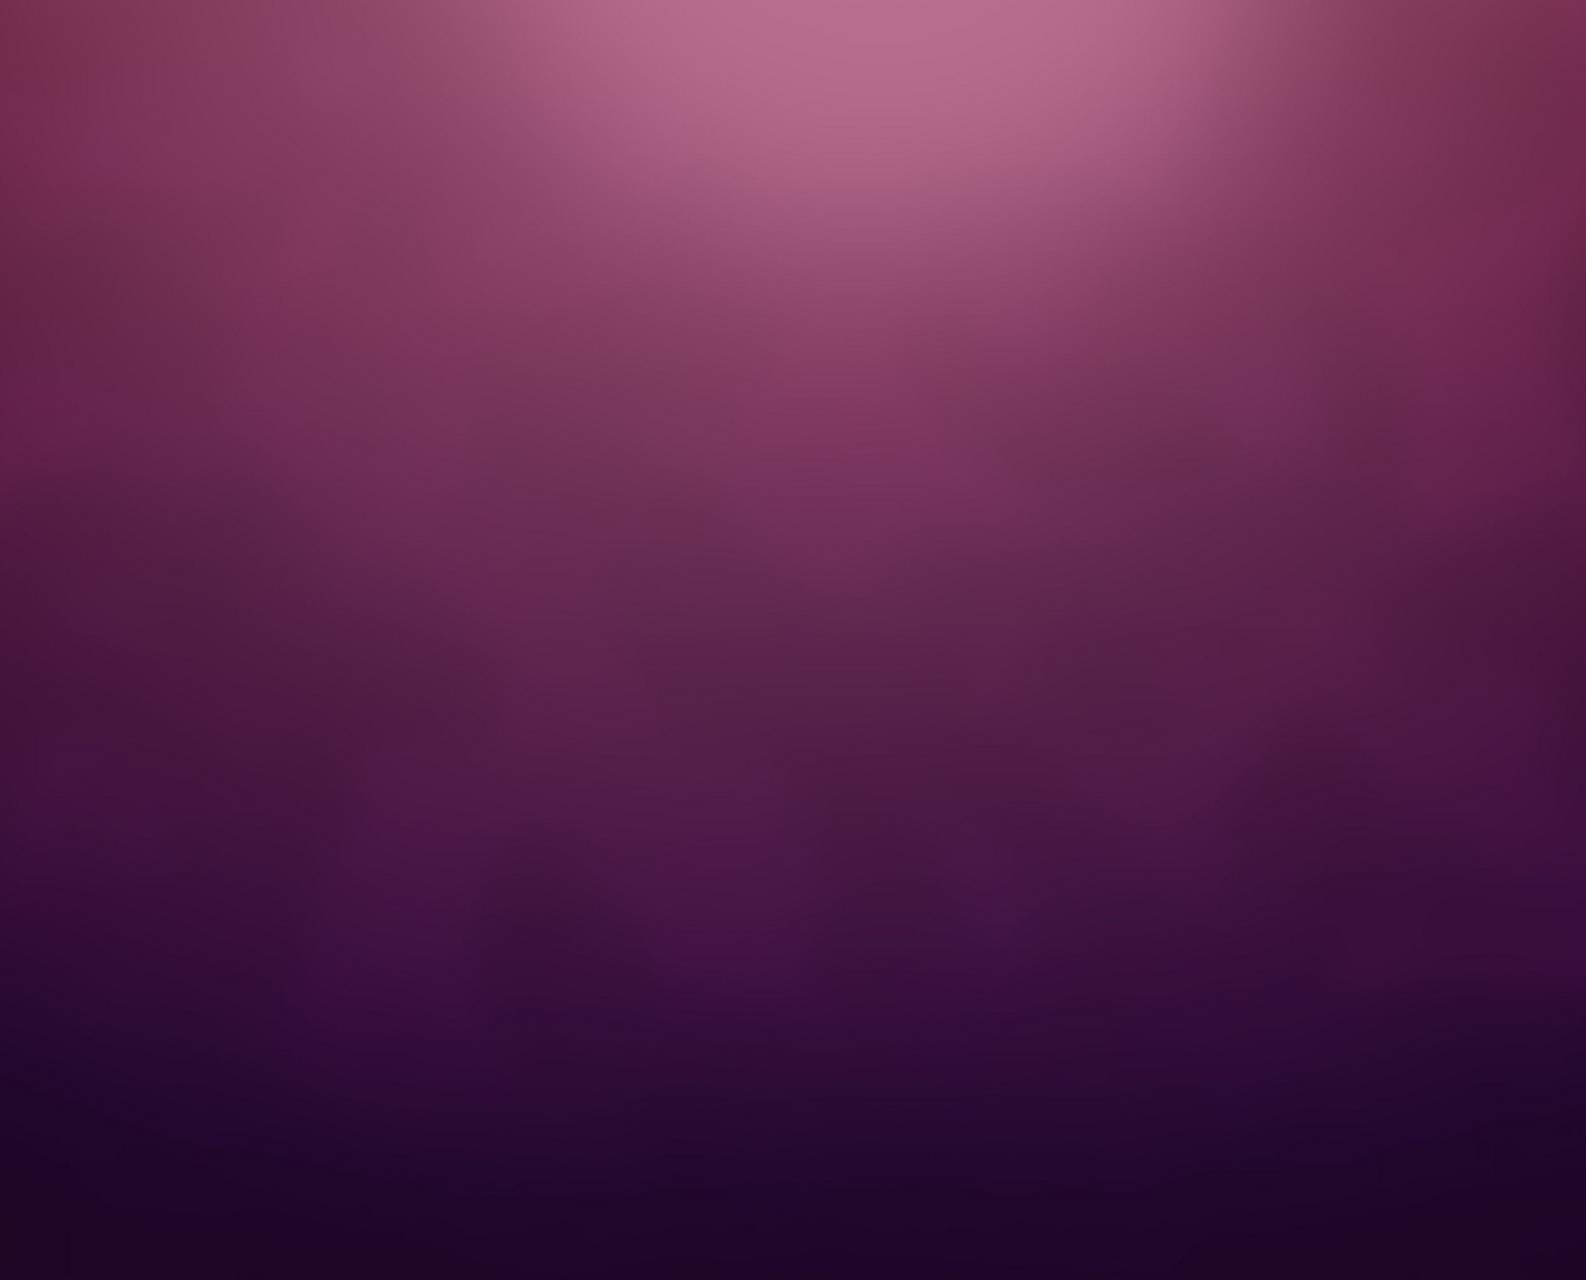 Purple 2015